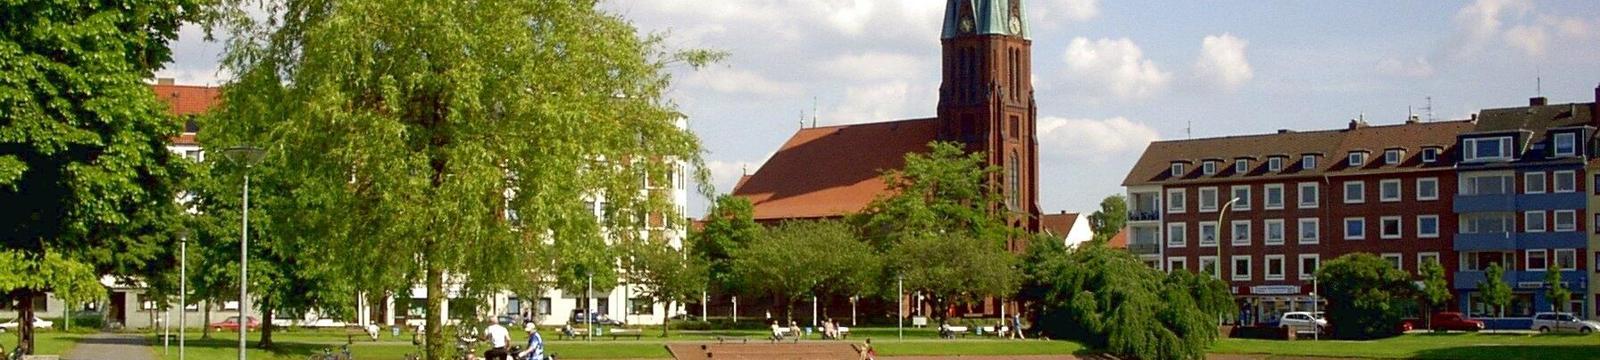 Gay Kontakte Bremen